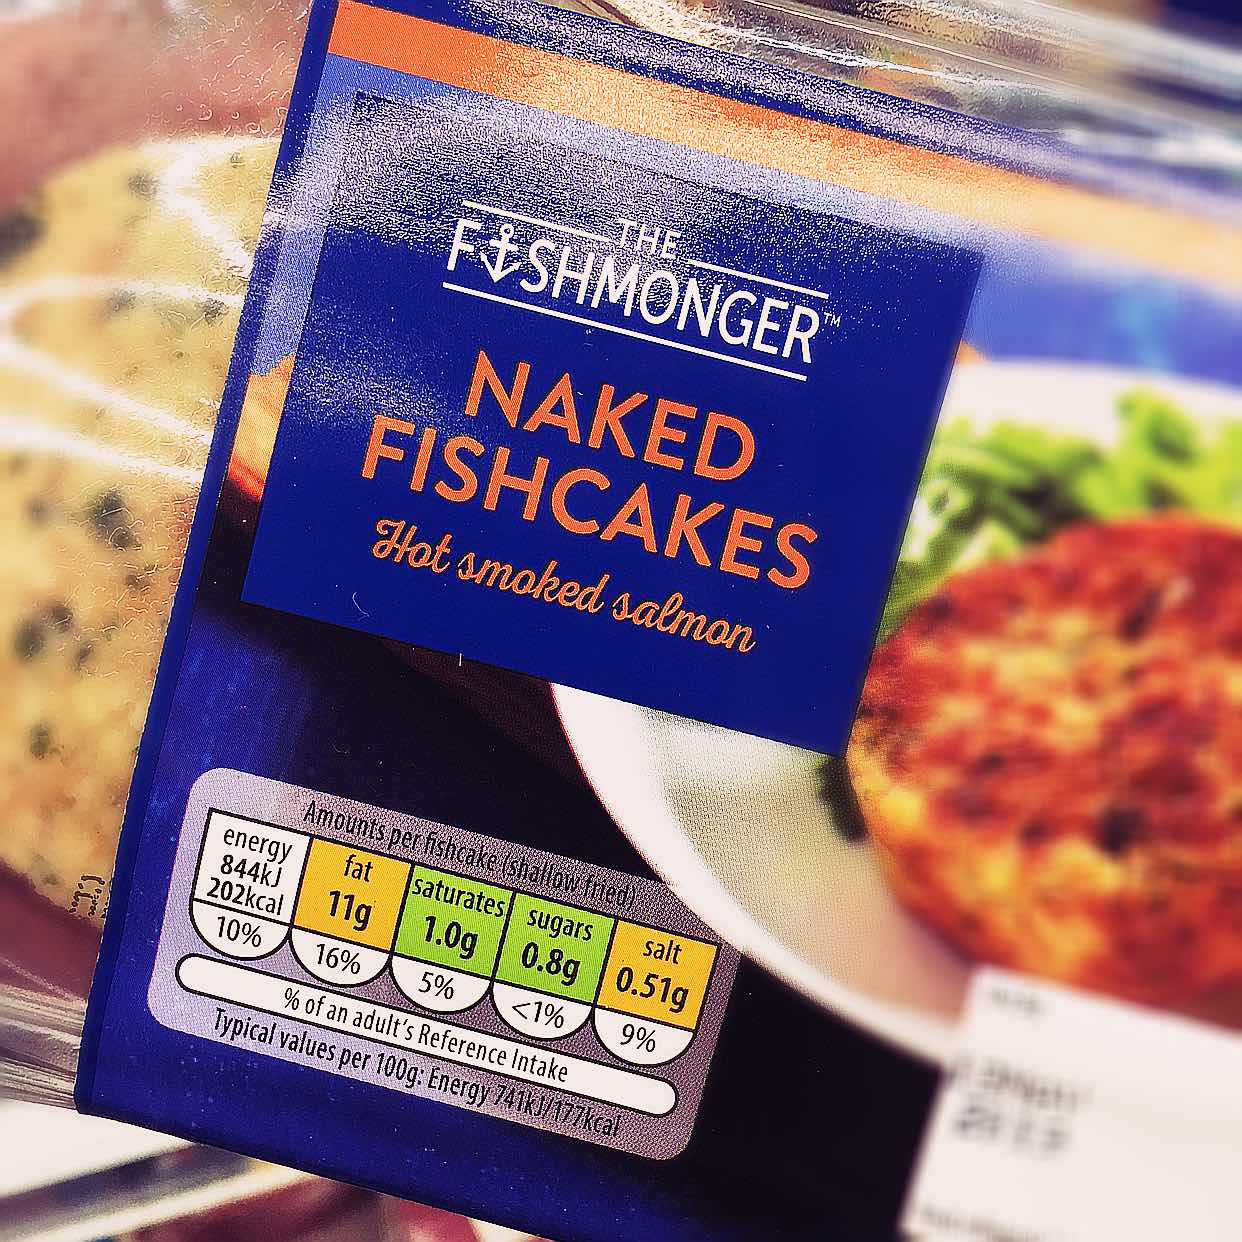 The Skinny Doll: The Fishmonger Fishcakes from Aldi!